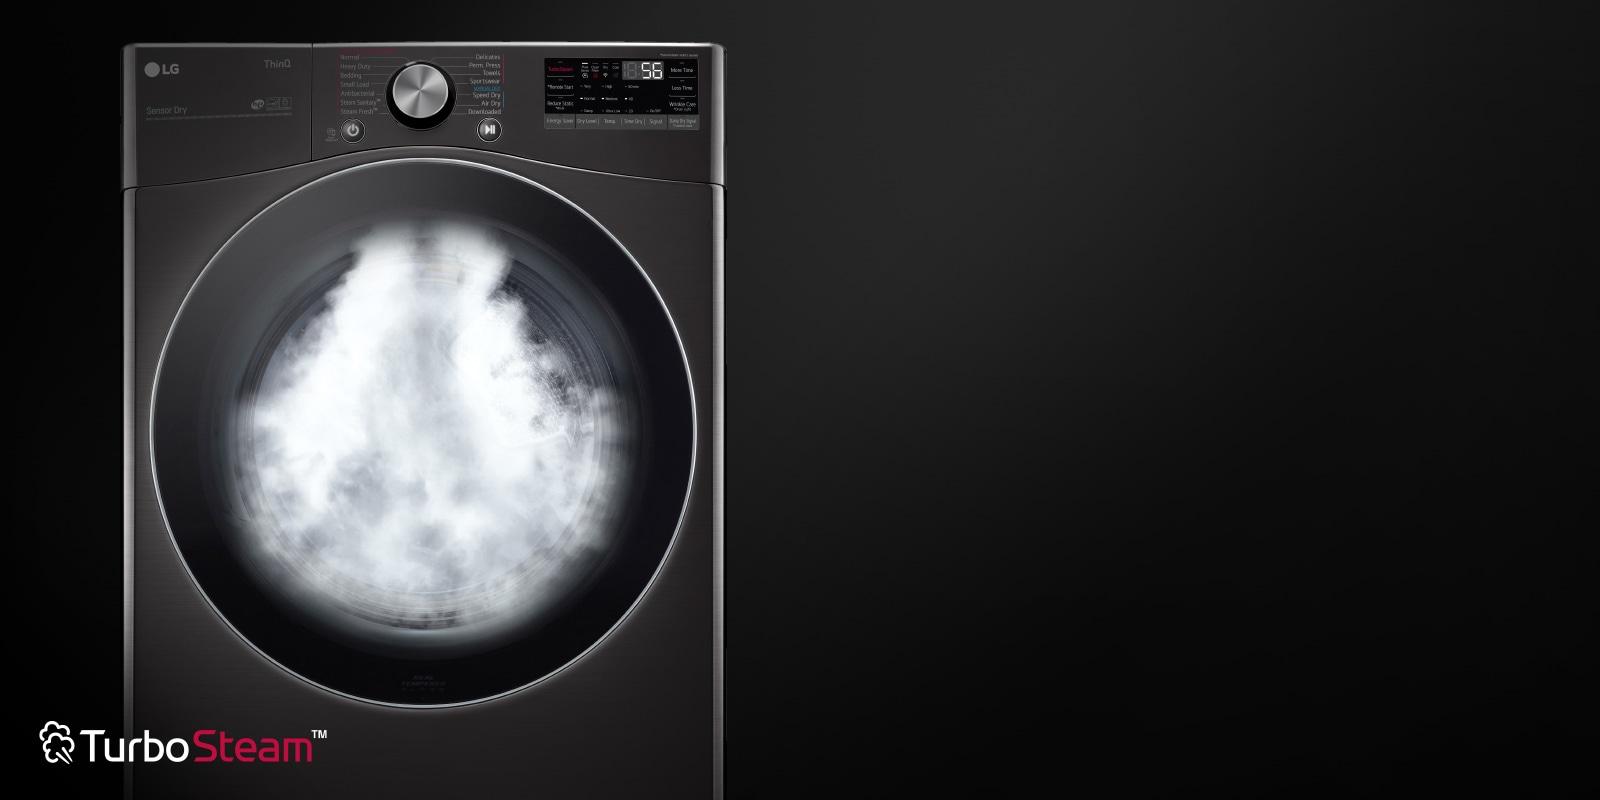 Dryer showcasing TurboSteam™ technology feature